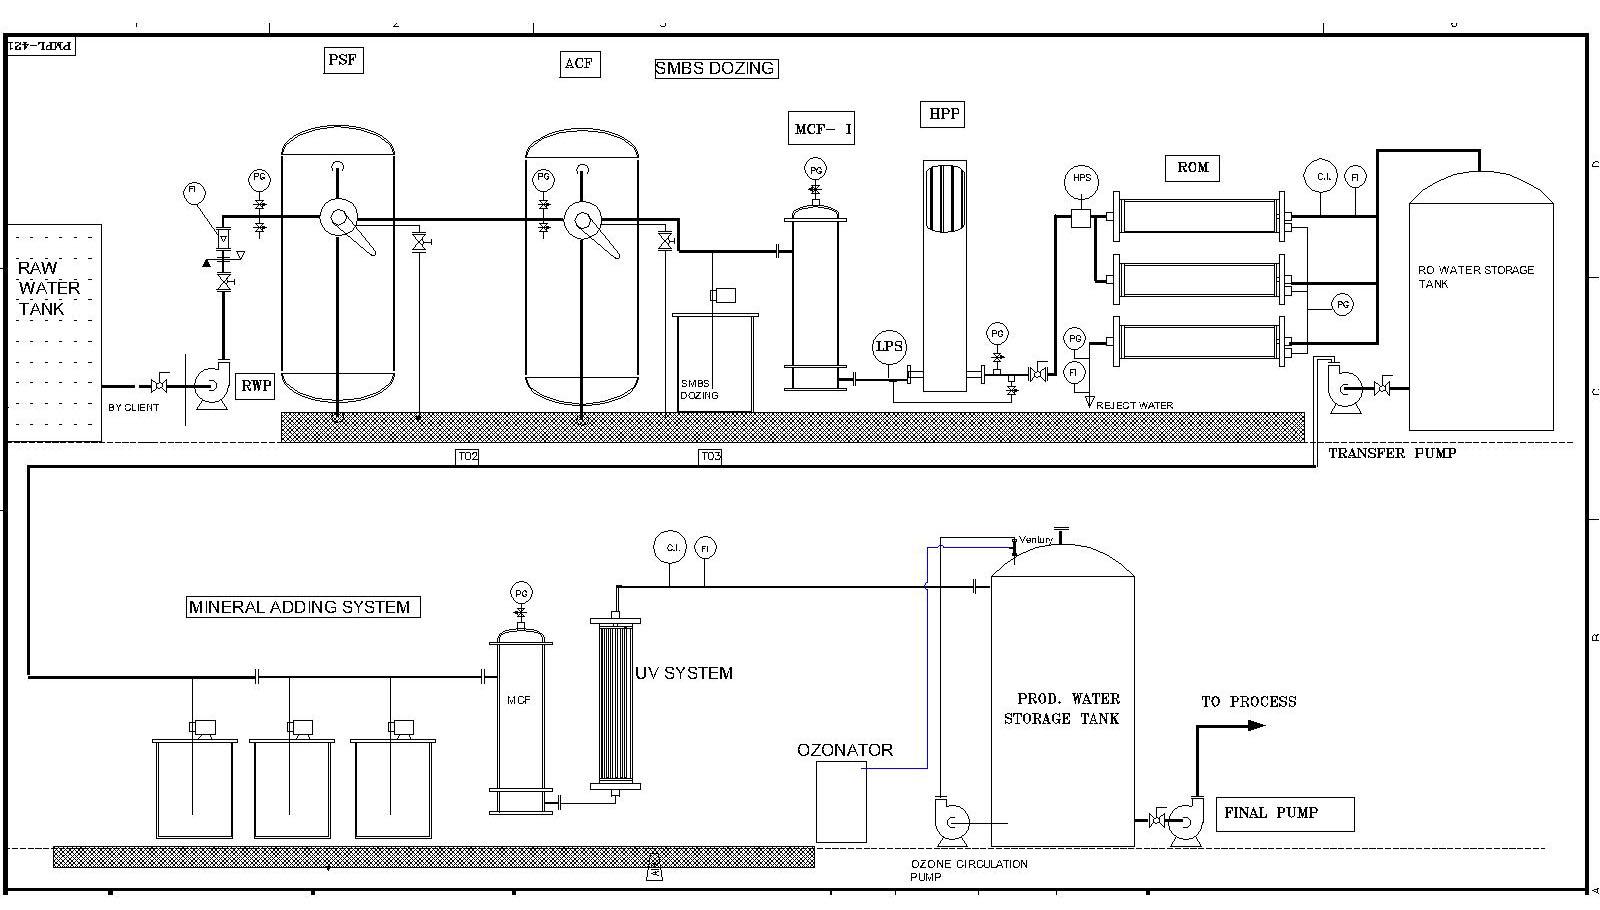 ro plant process flow diagram animation